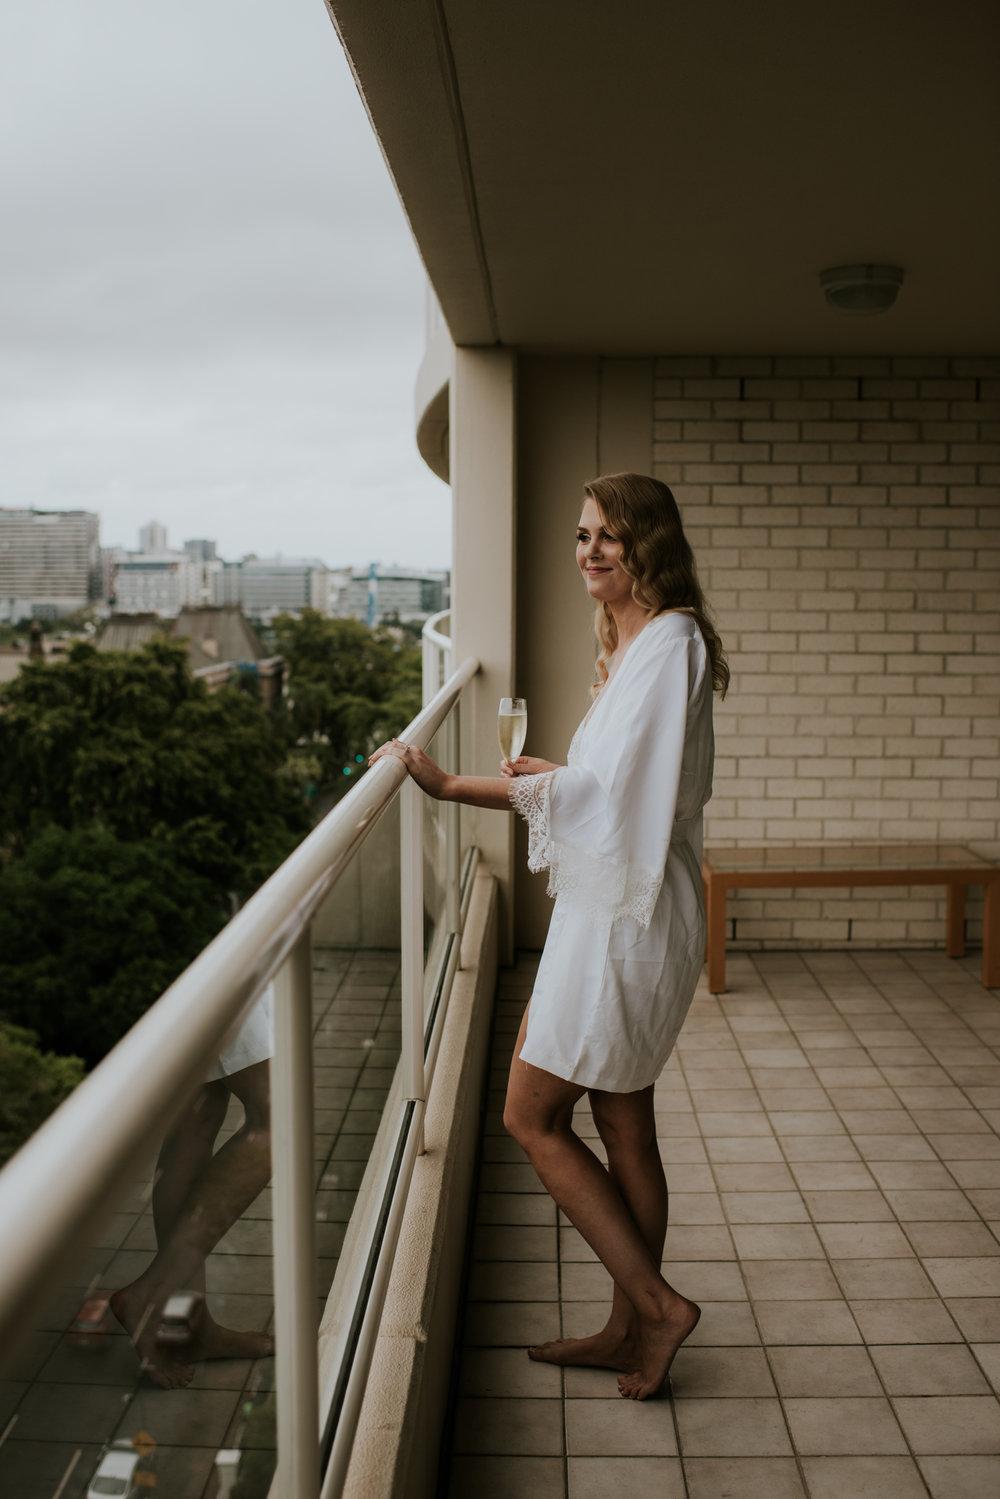 Brisbane Wedding Photographer | Engagement-Elopement Photography | Factory51-City Botantic Gardens Wedding-6.jpg